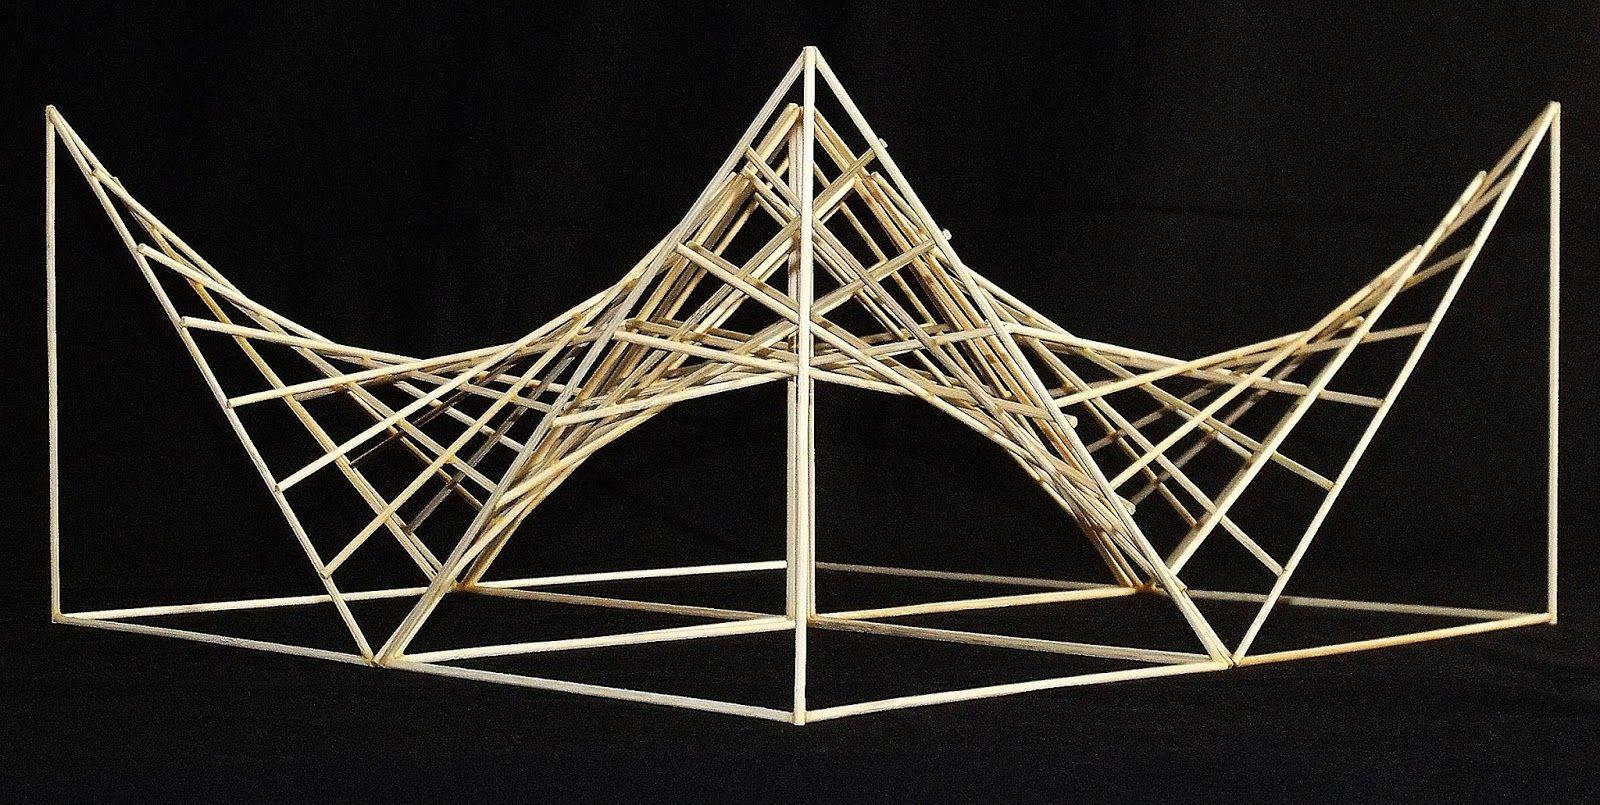 Paraboloide Hiperbolico Paraboloid T Architecture